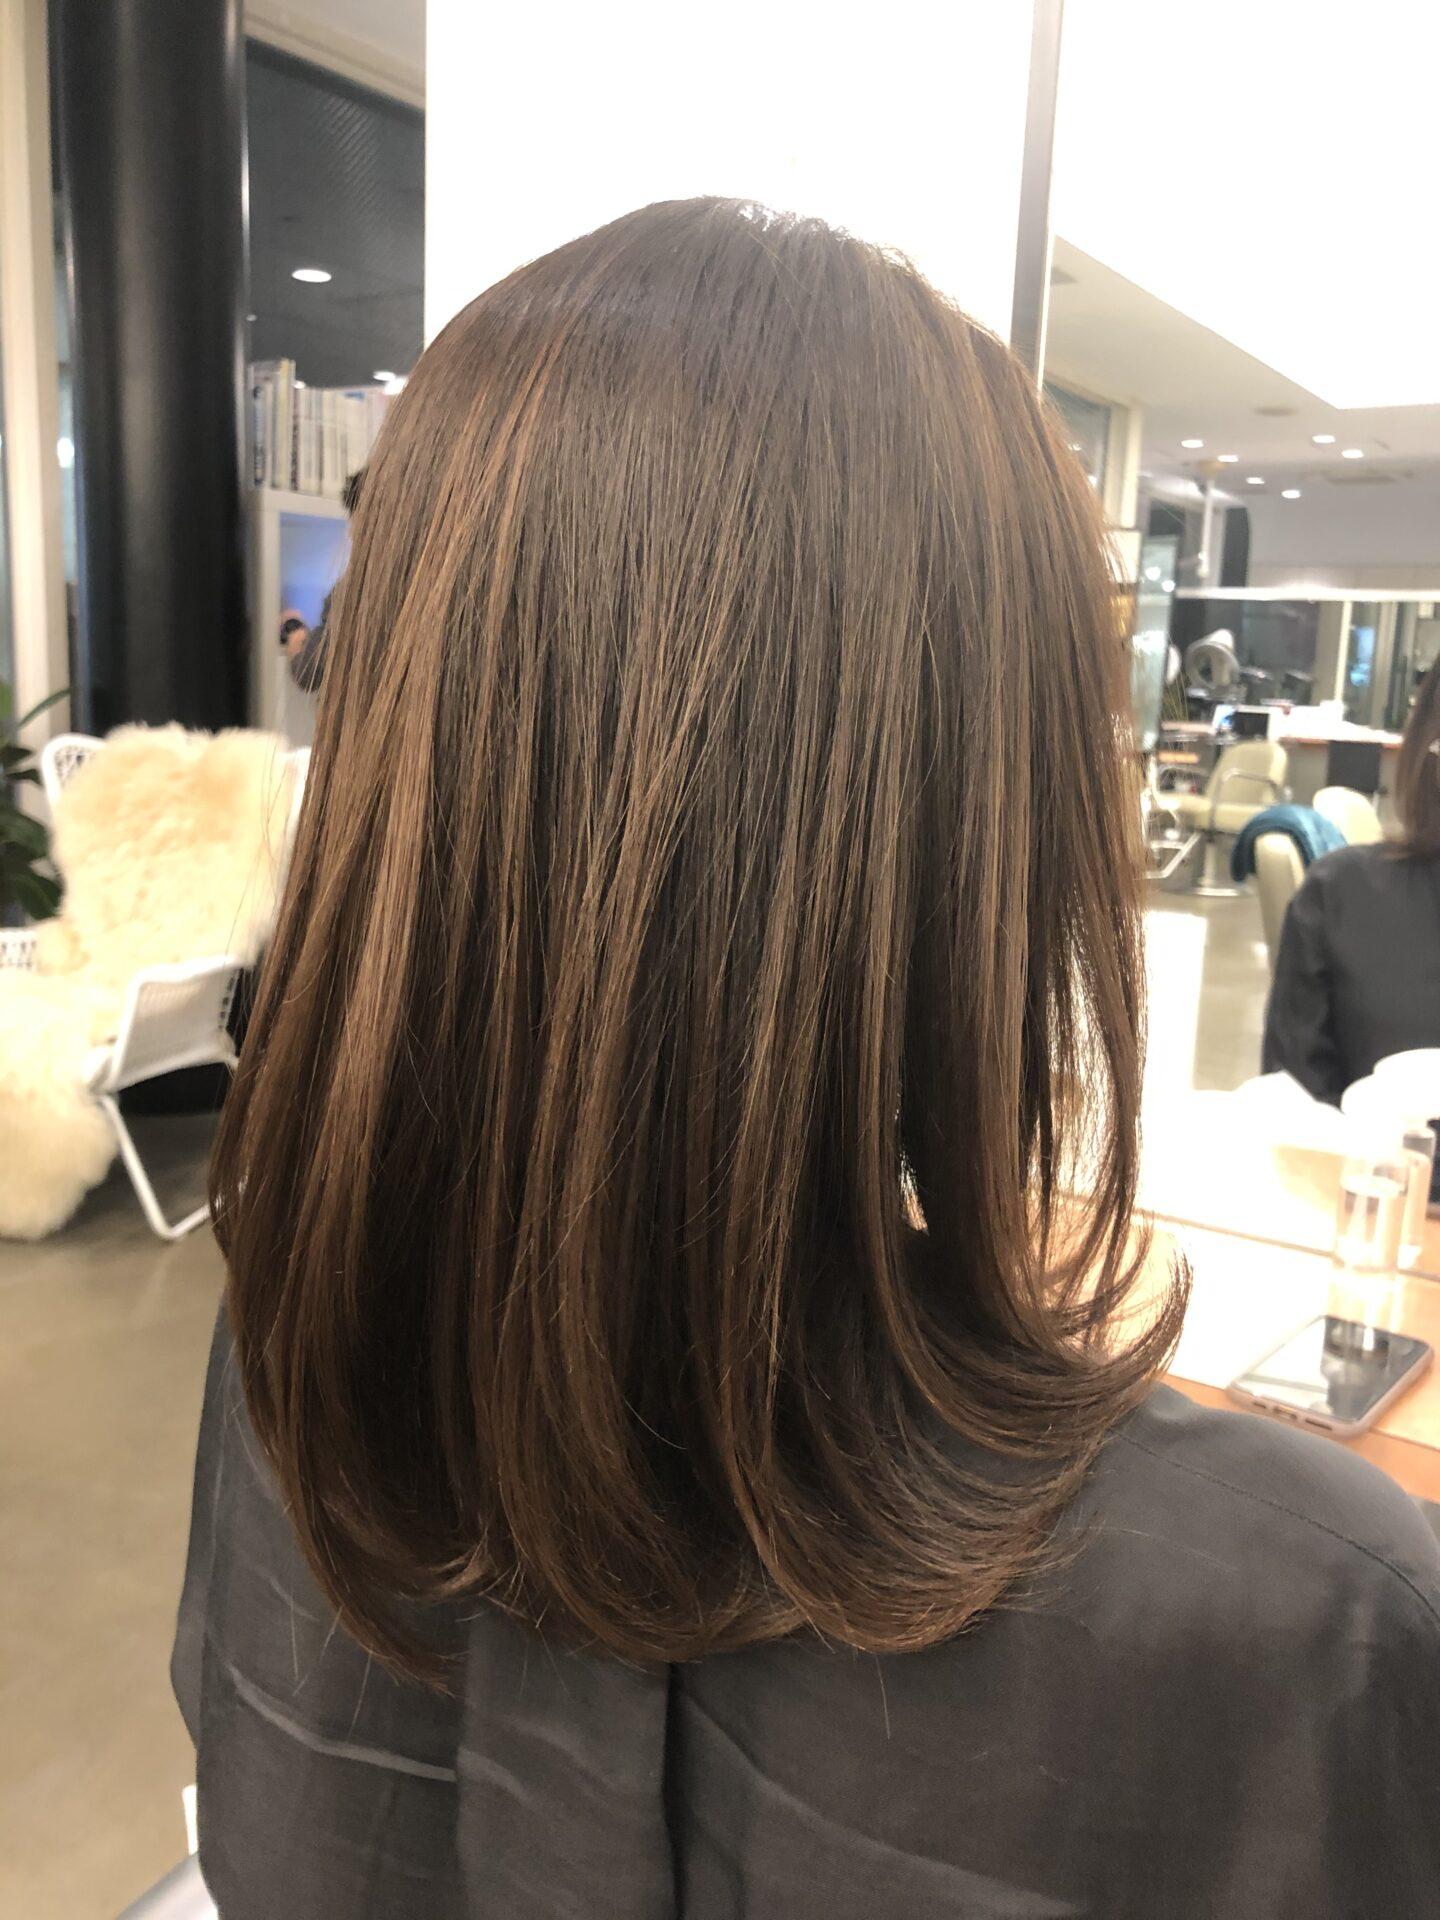 DIFINO  aoyam director 佐野行俊 ストレートパーマのこだわりと髪の強度強化なお話し